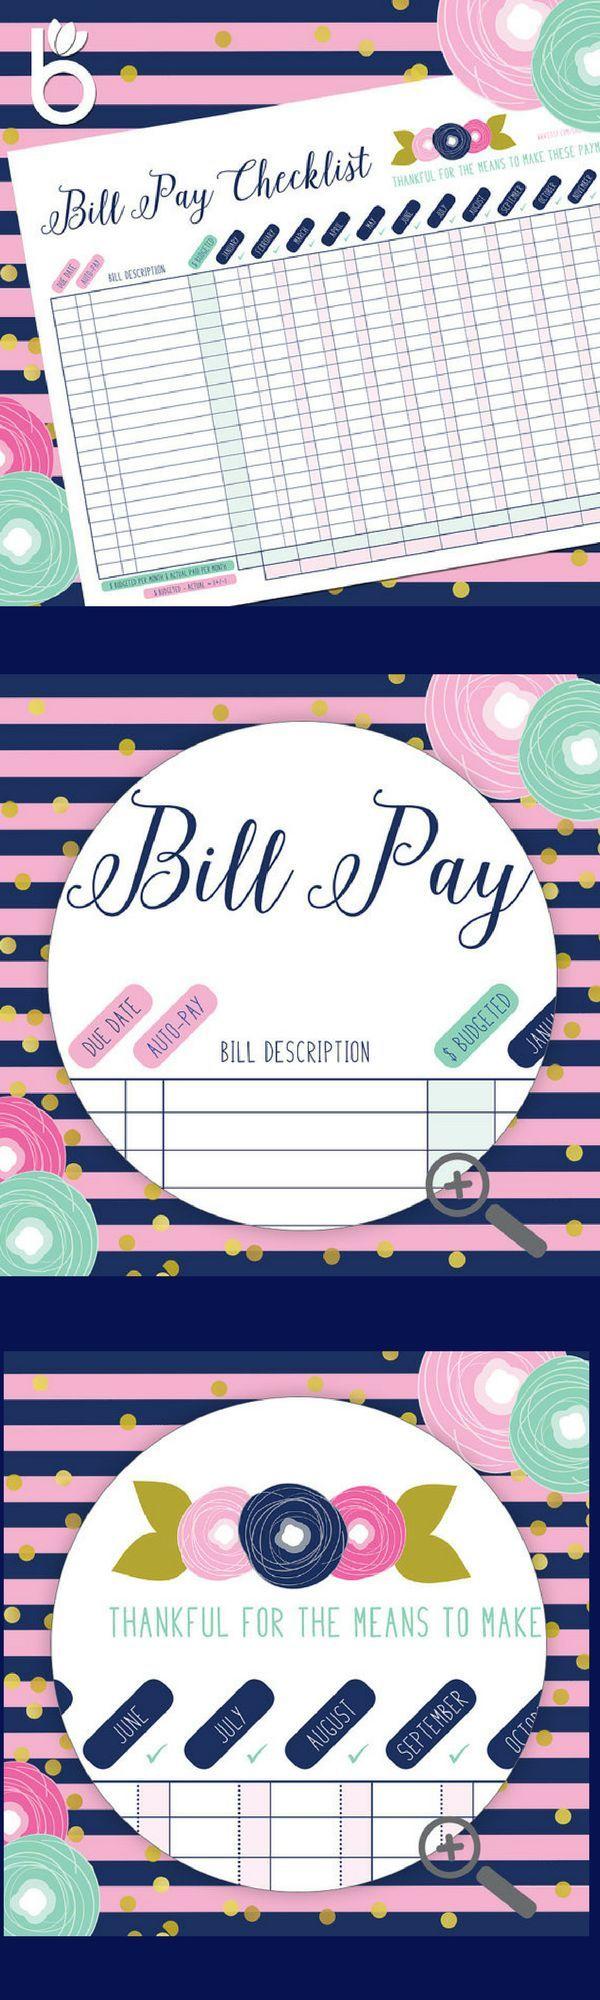 Bill Organizer, Bill Paying Organizer, Monthly Bills Organizer, Bill Tracker, Bill Pay, Bill Pay Tracker, Budget, Family Planner, Printable #budget #bills #organization #affiliate